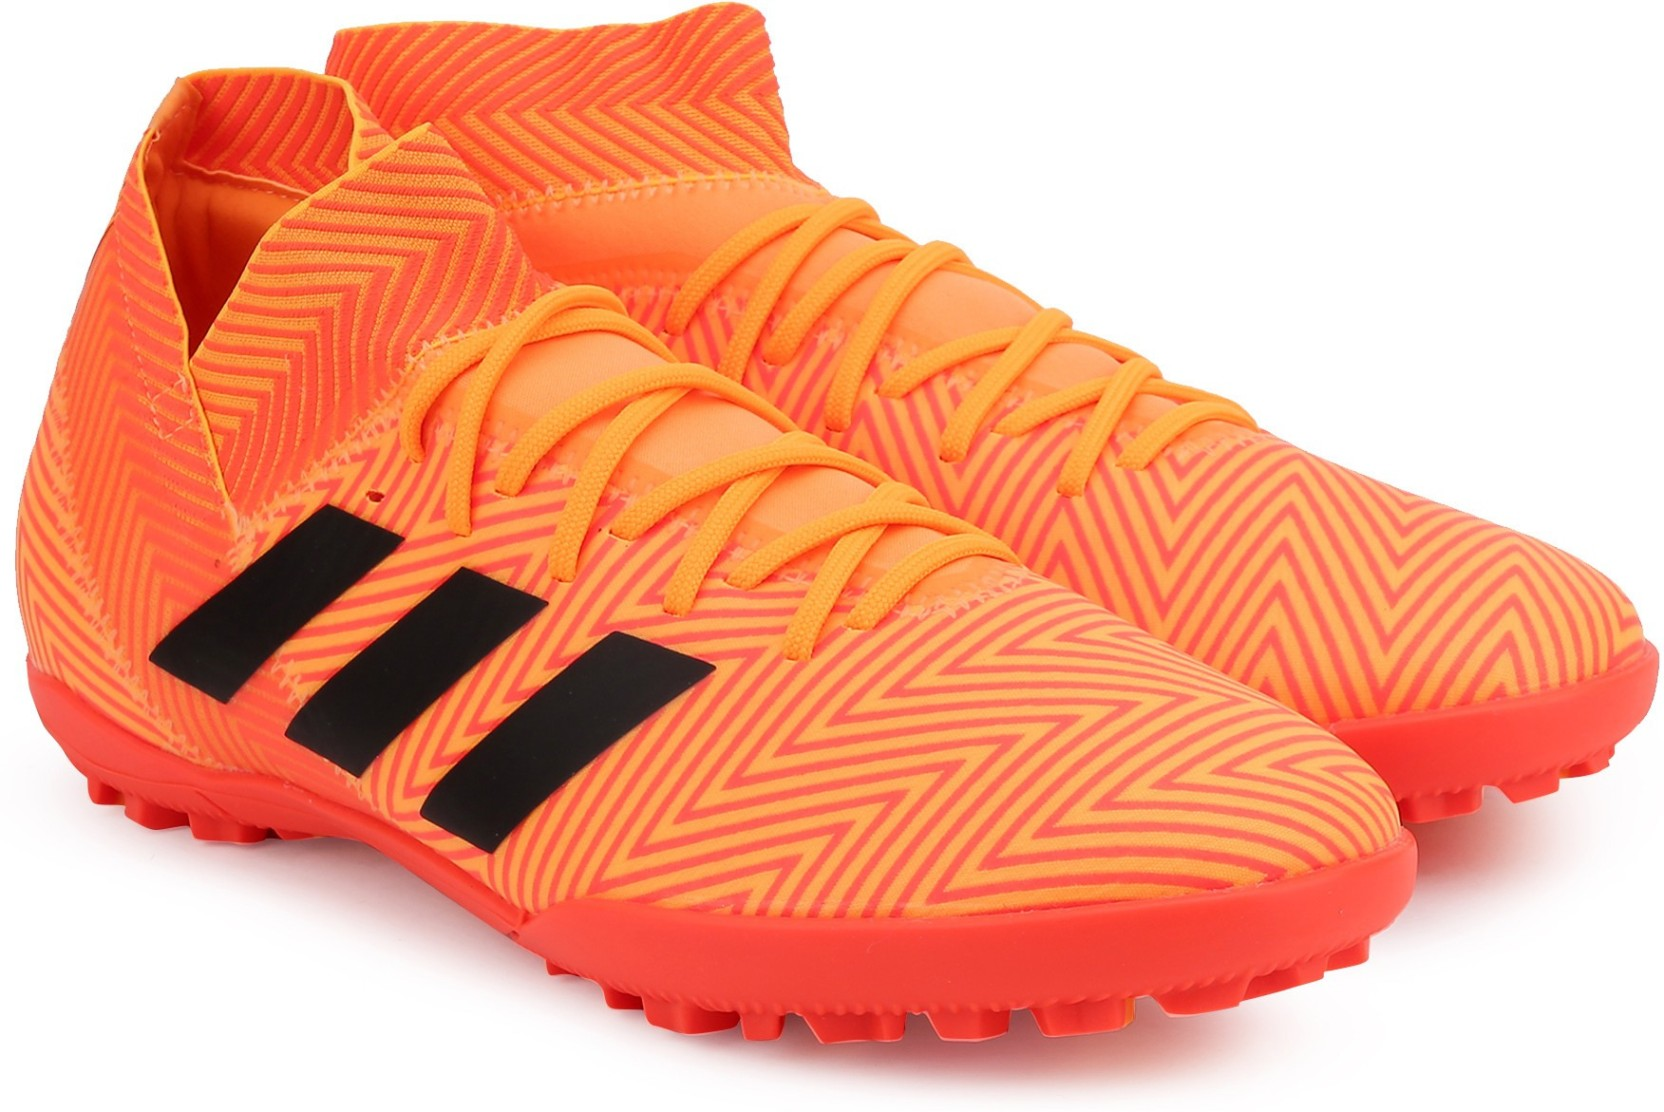 pretty nice 15094 06d9e ADIDAS NEMEZIZ TANGO 18.3 TF Football Shoes For Men (Orange)